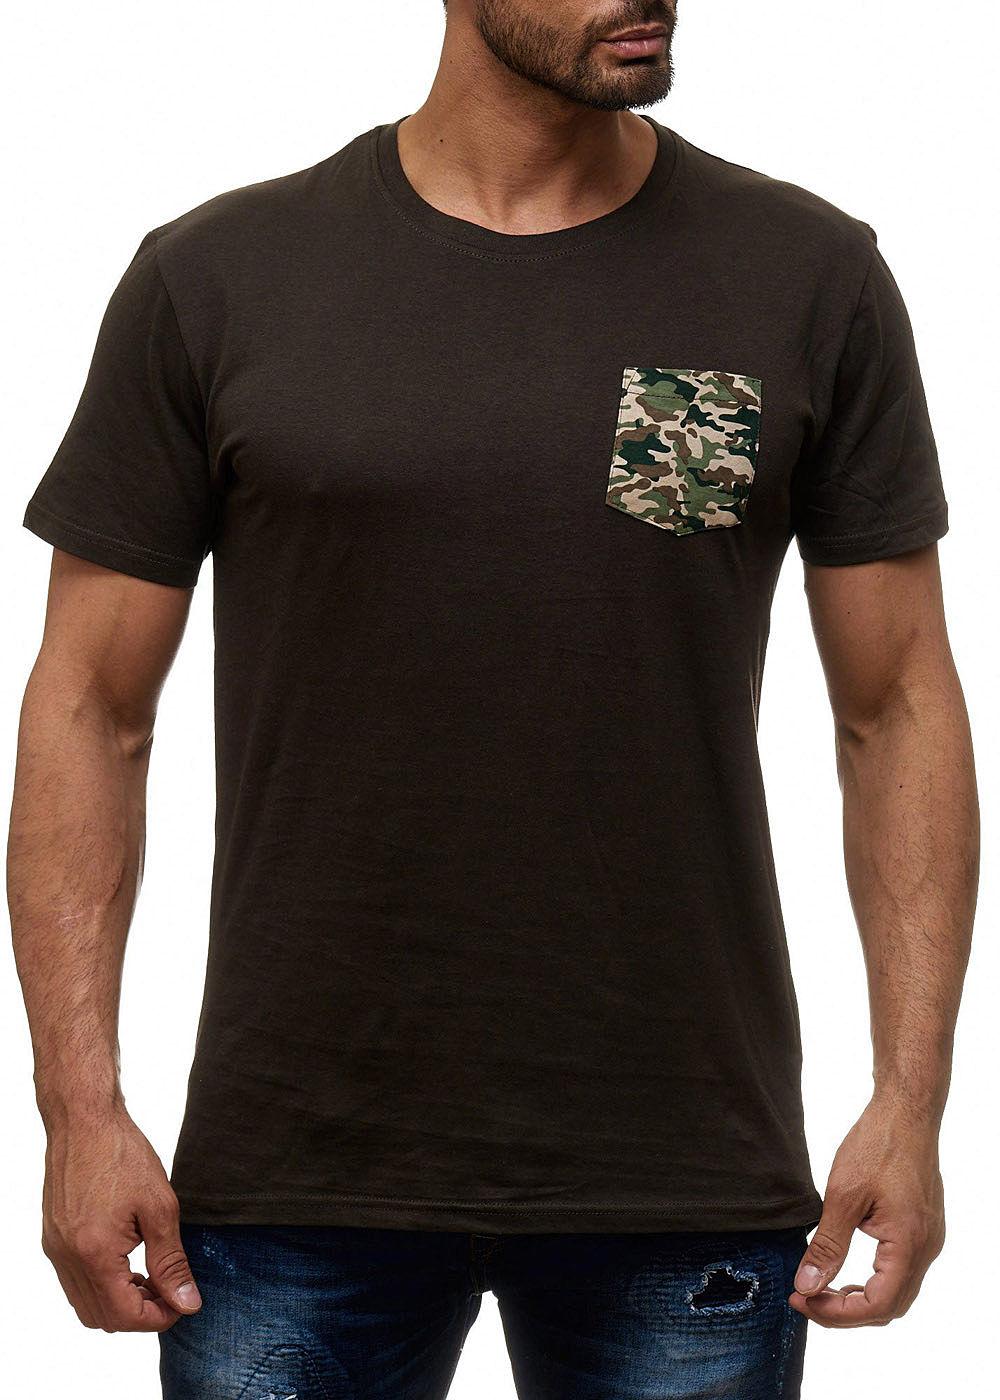 seventyseven lifestyle herren t shirt longform brusttasche khaki gr n camouflage 77onlineshop. Black Bedroom Furniture Sets. Home Design Ideas